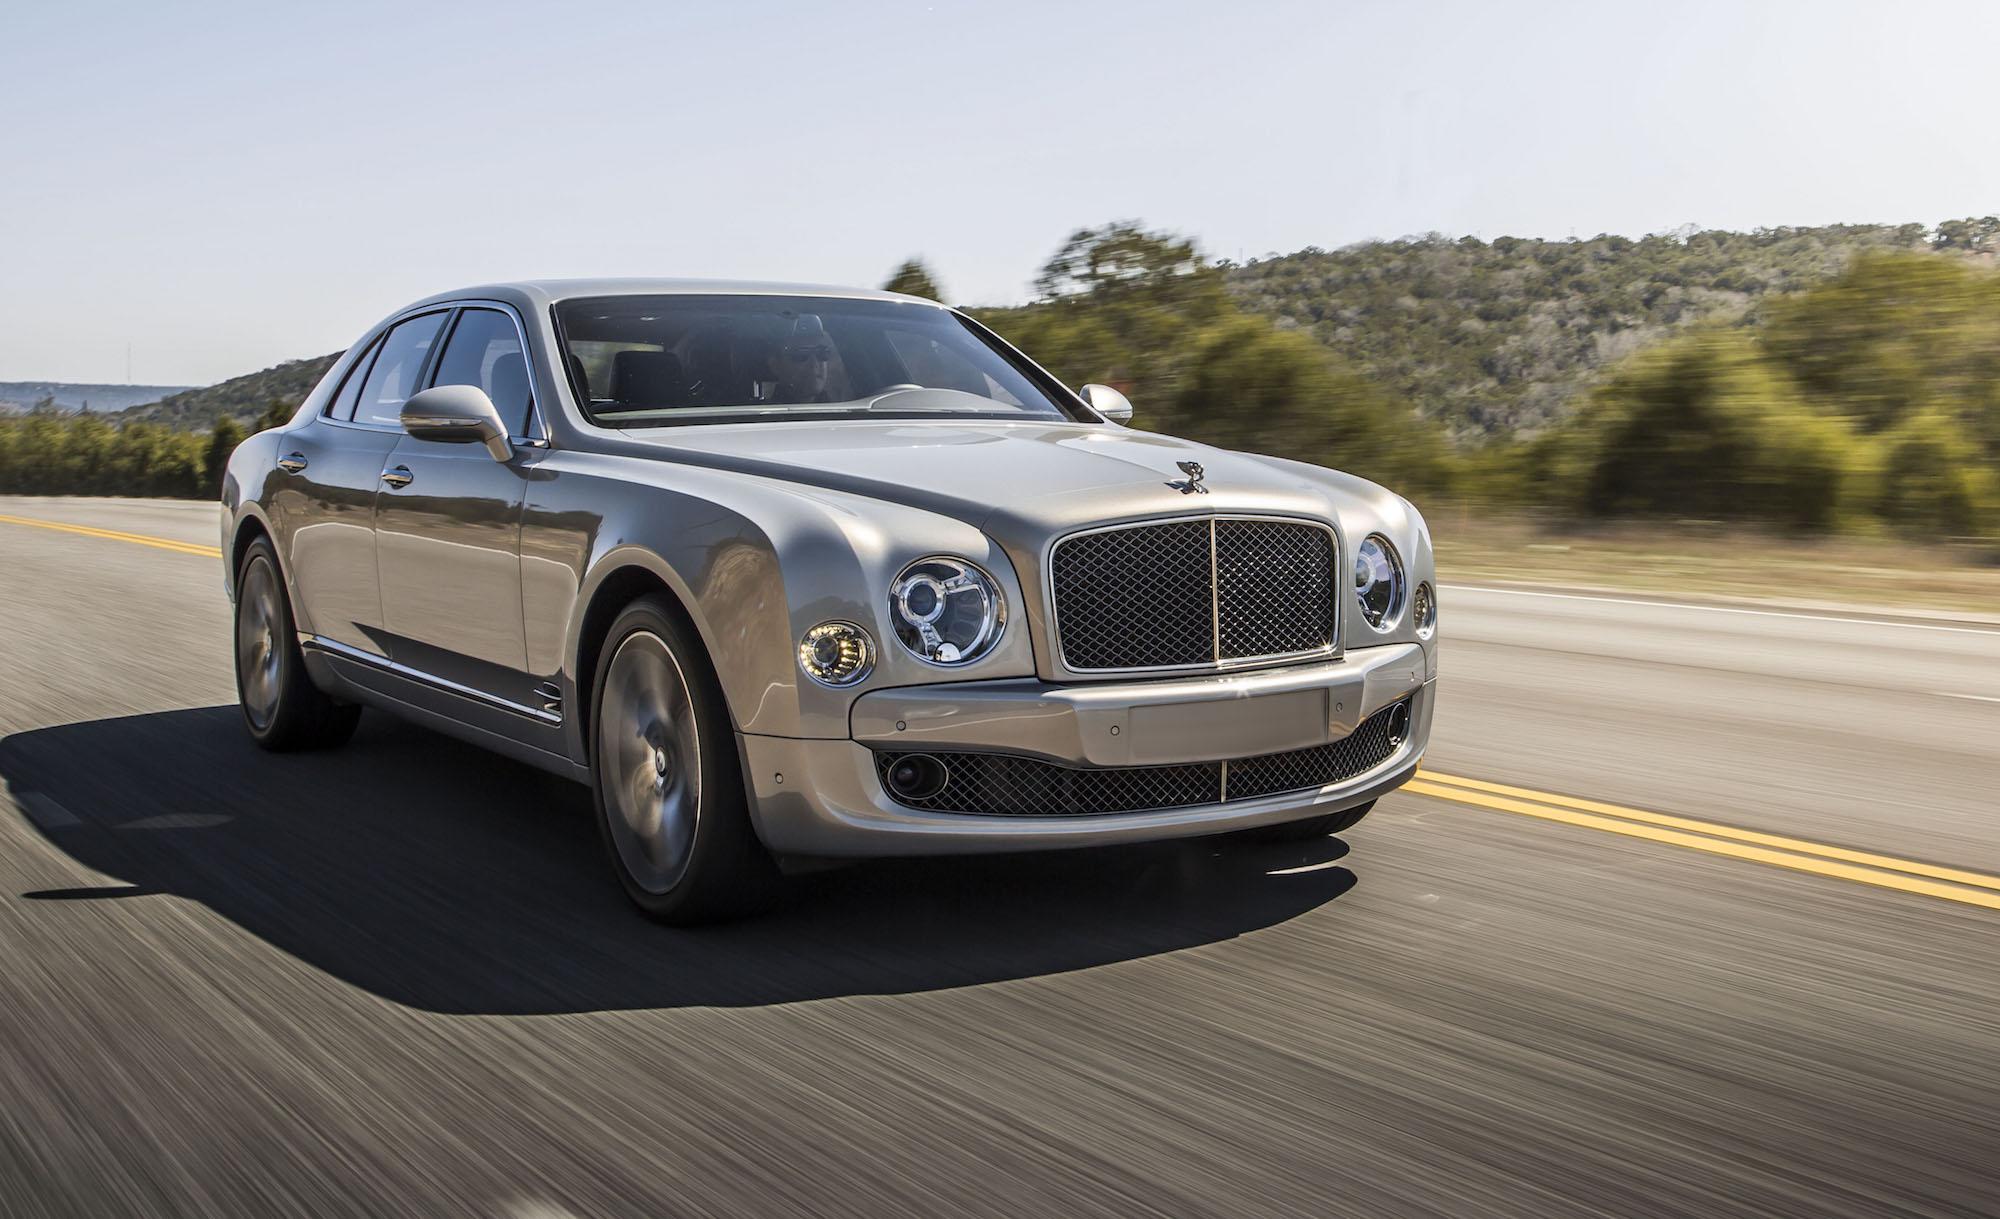 Test Drive: 2015 Bentley Mulsanne